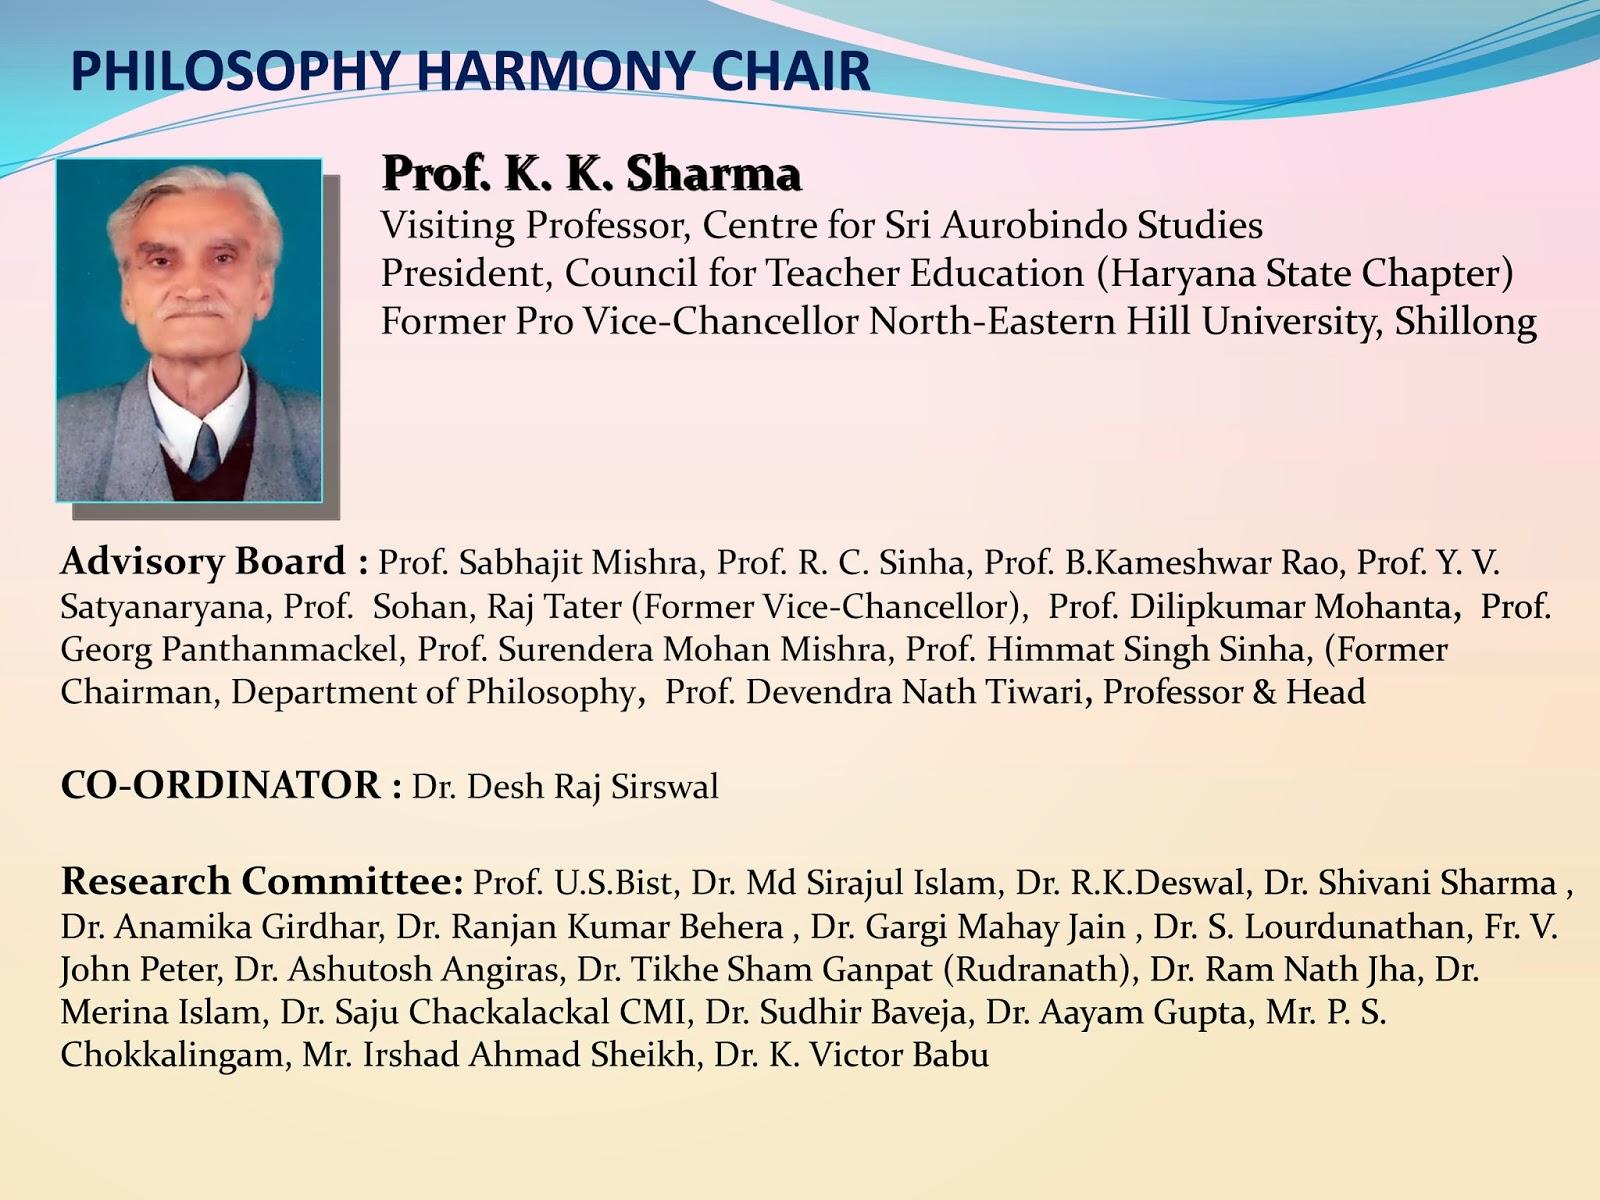 philosophical chairs topics dallas cowboys chair cover interdisciplinary studies